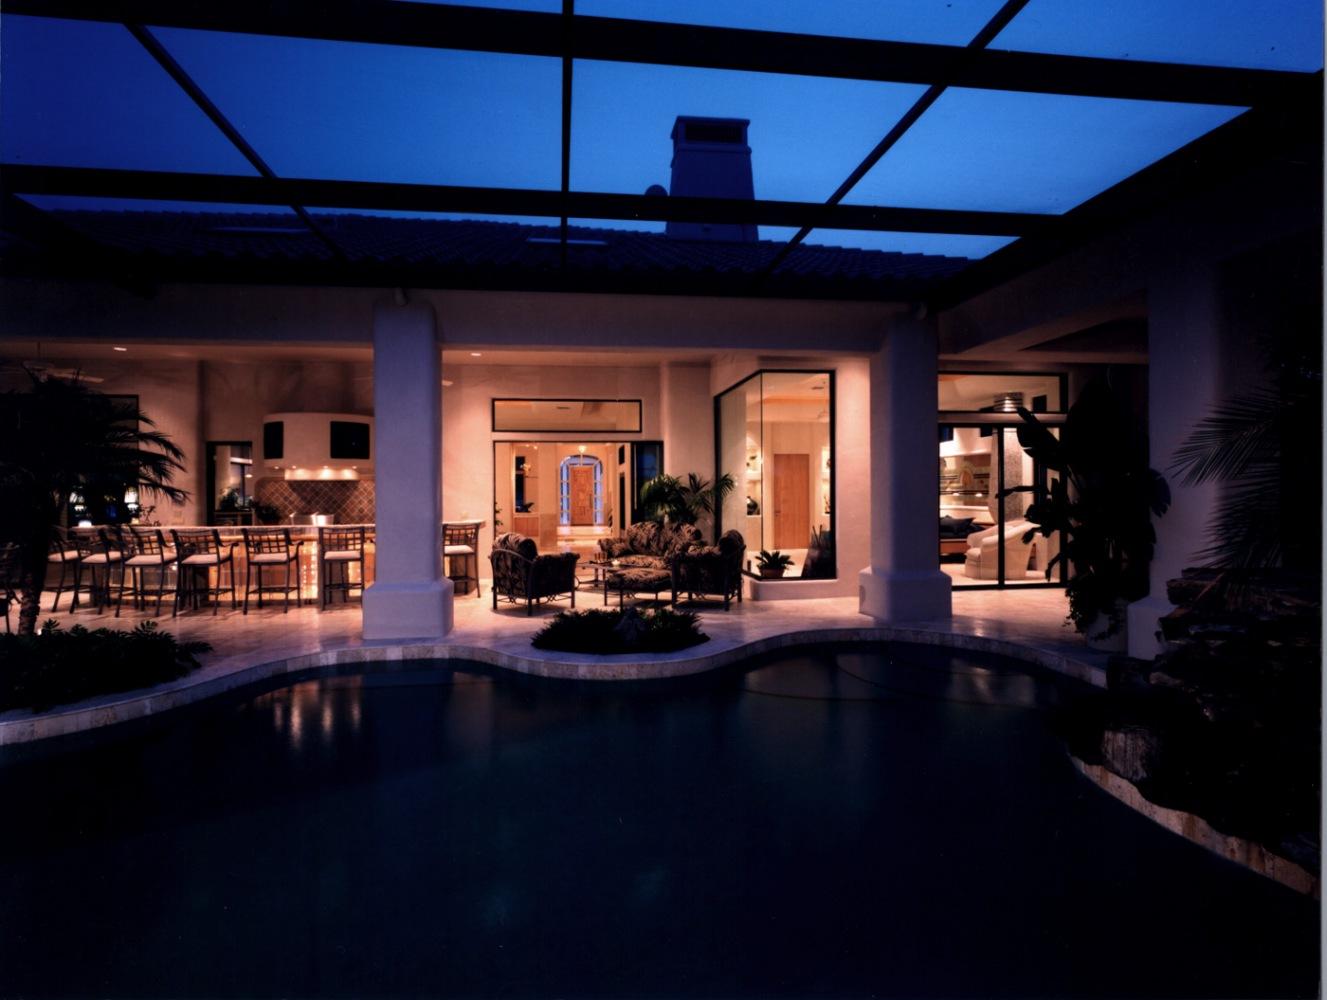 5500-Isleworth-Country-Club-Drive-Pool-10.jpg